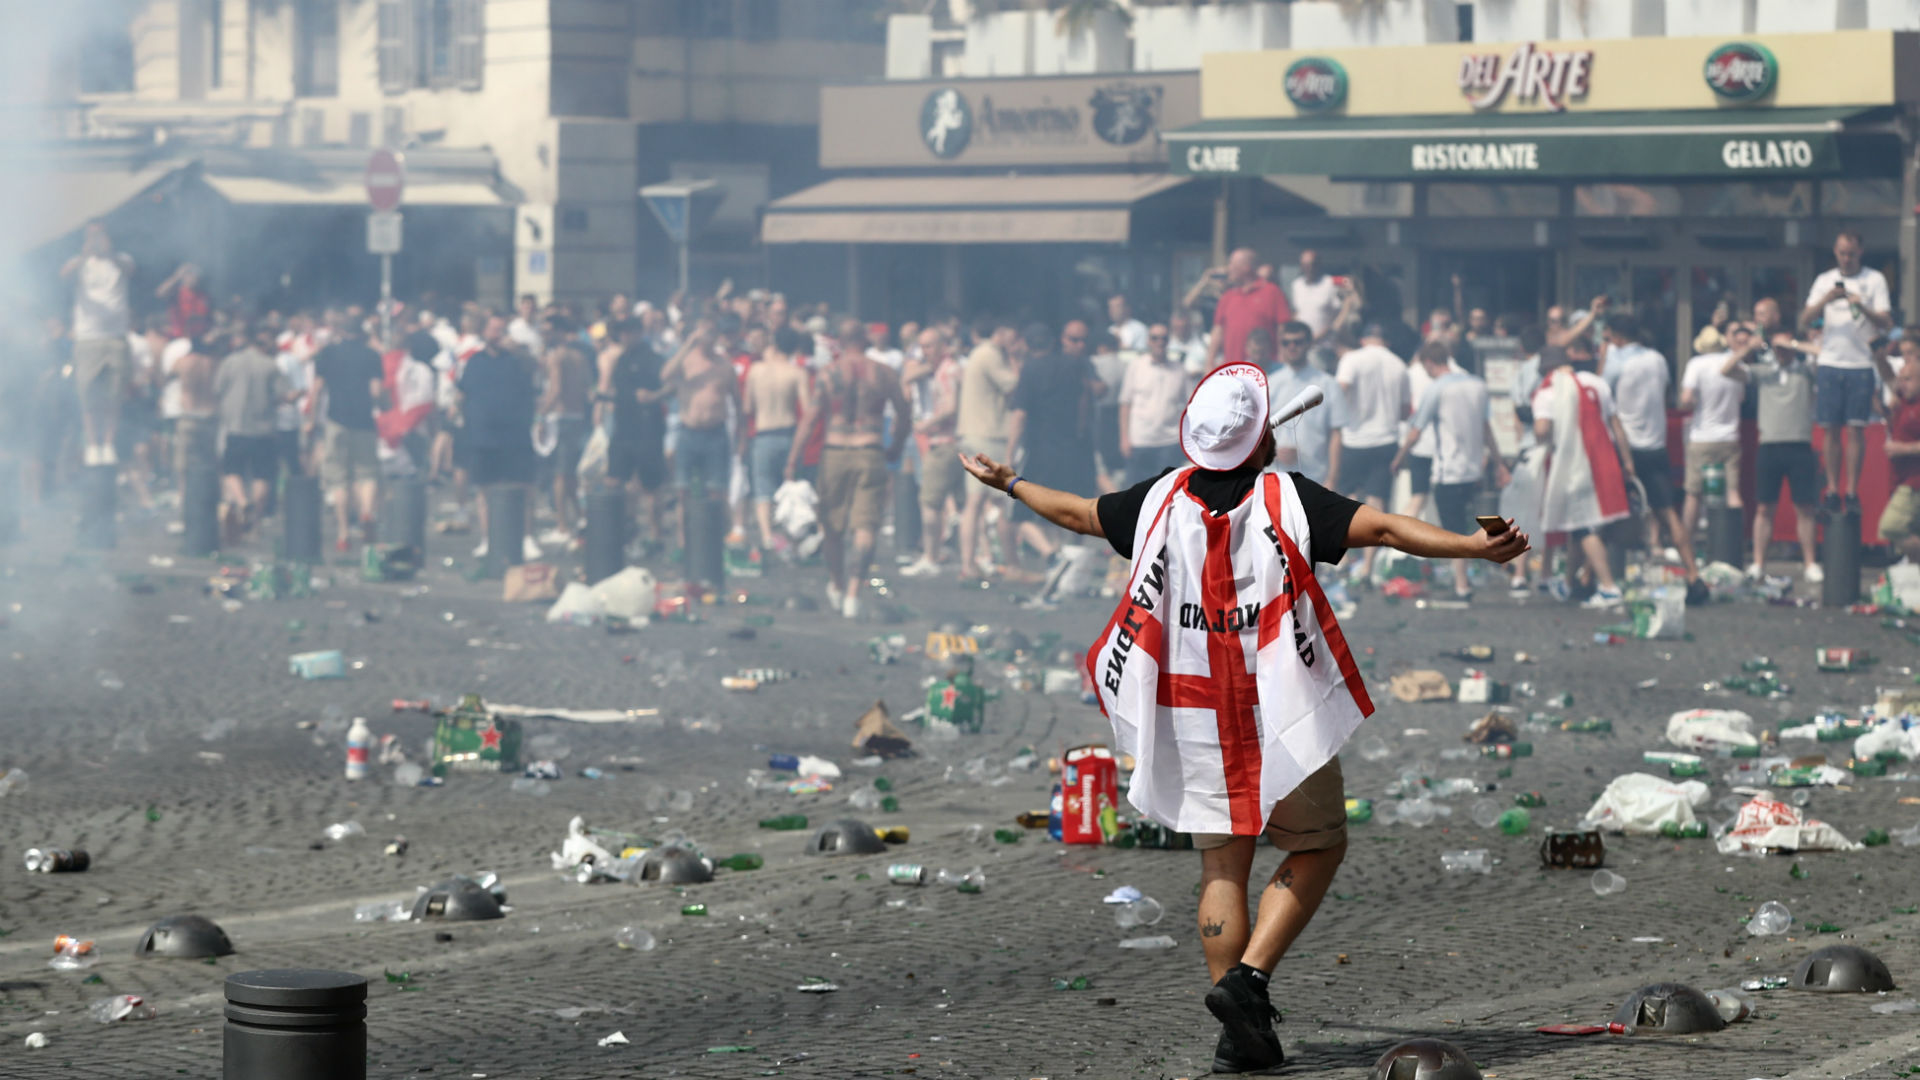 Euro 2016 hooligan England